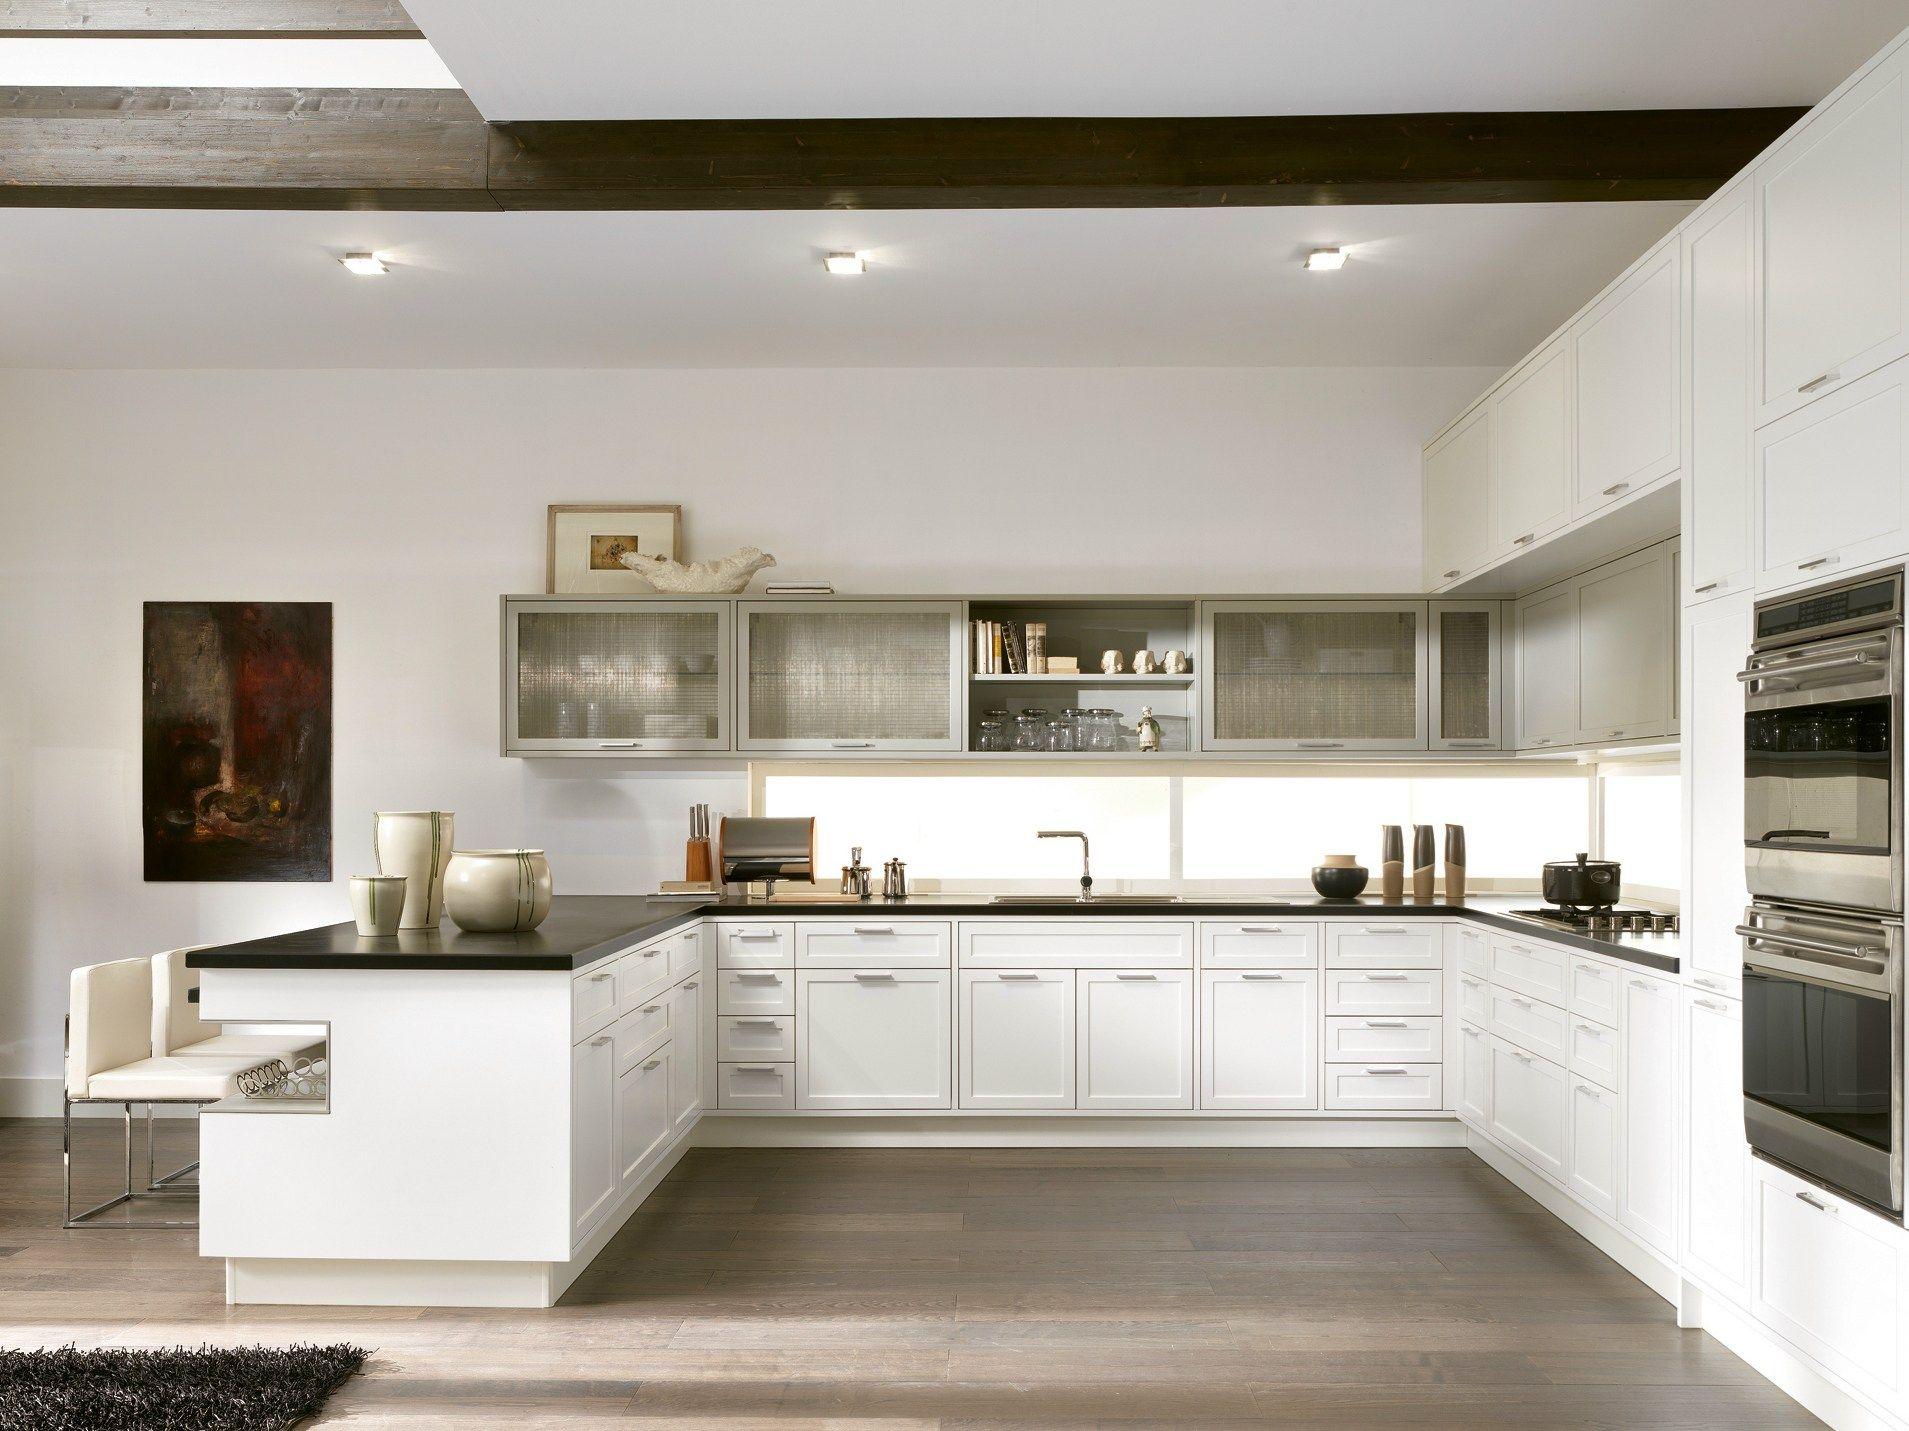 Cucine Stosa Grigio Roccia : Cucina stosa milly grigio roccia ...